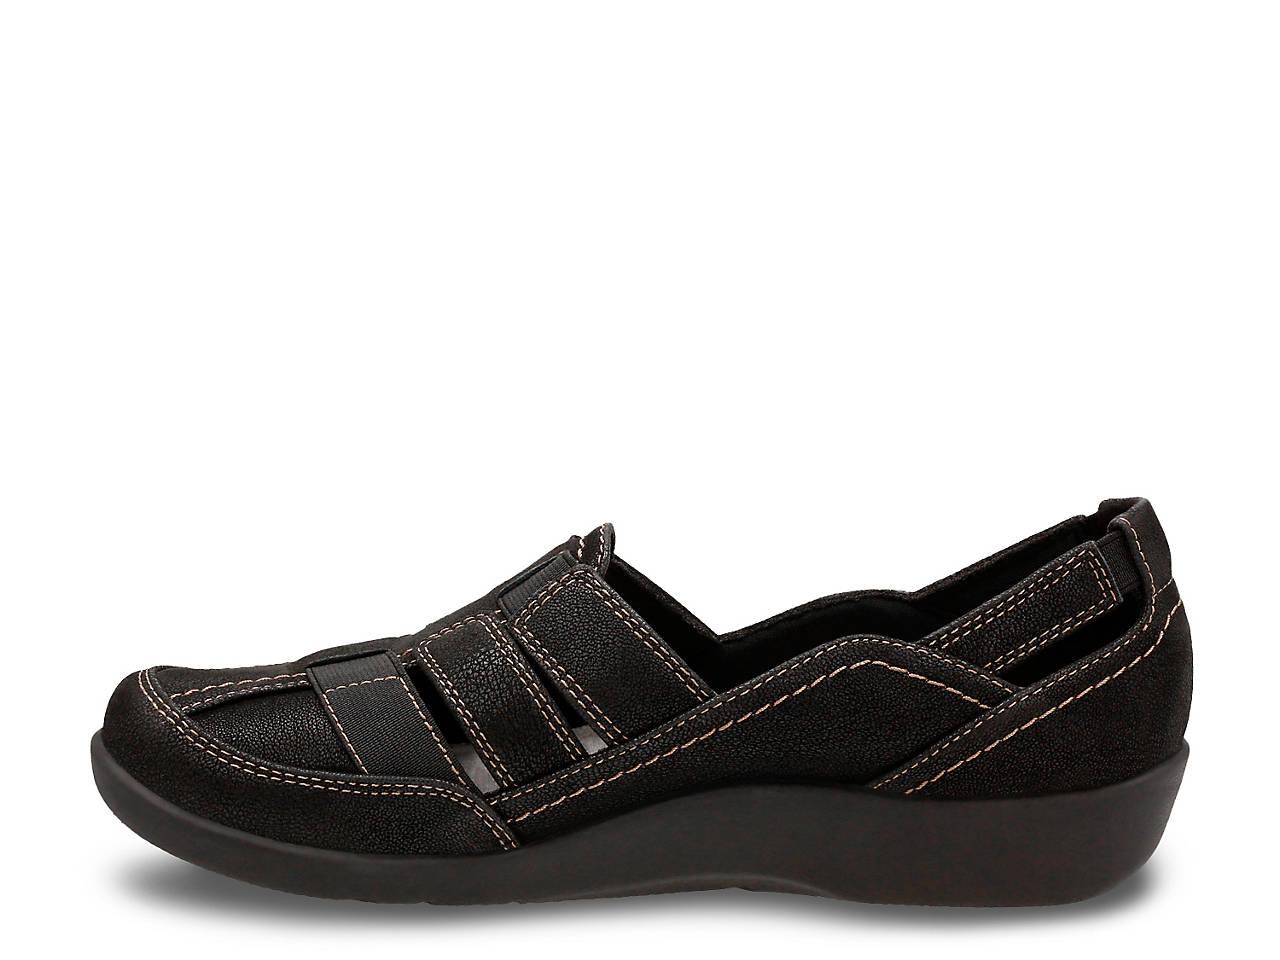 c7fd1d4195fe Clarks Cloudsteppers Sillian Stork Slip-On Women s Shoes